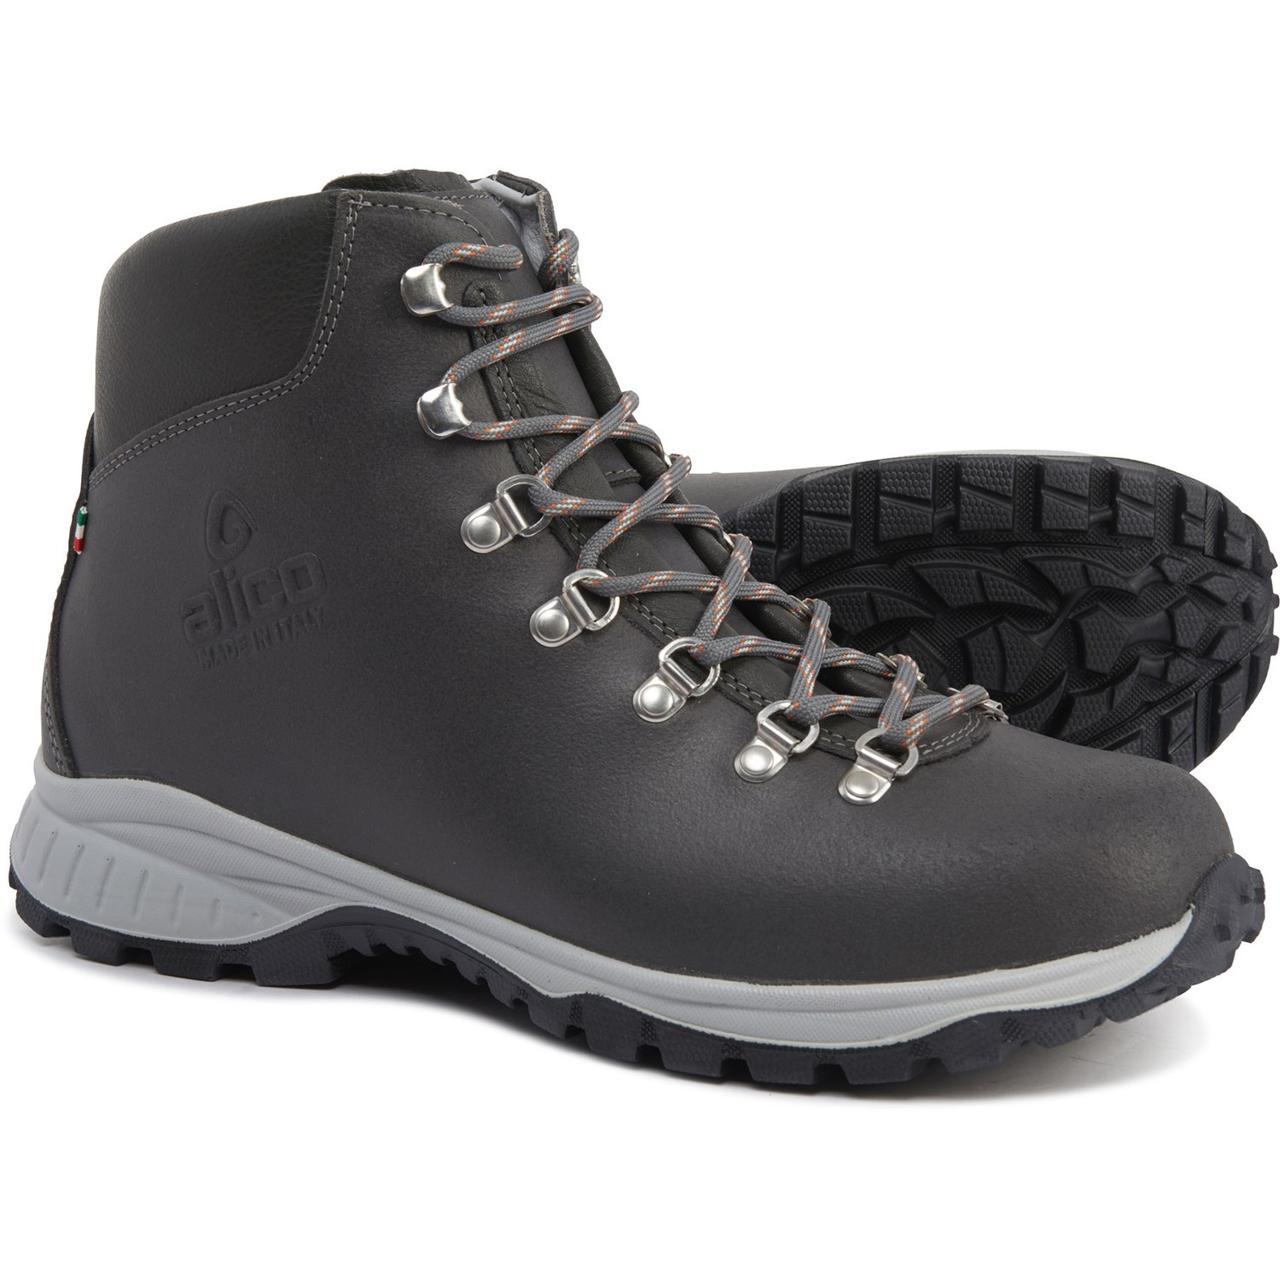 Ботинки трекинговые Alico Sherpa (Код ASHPG-43)